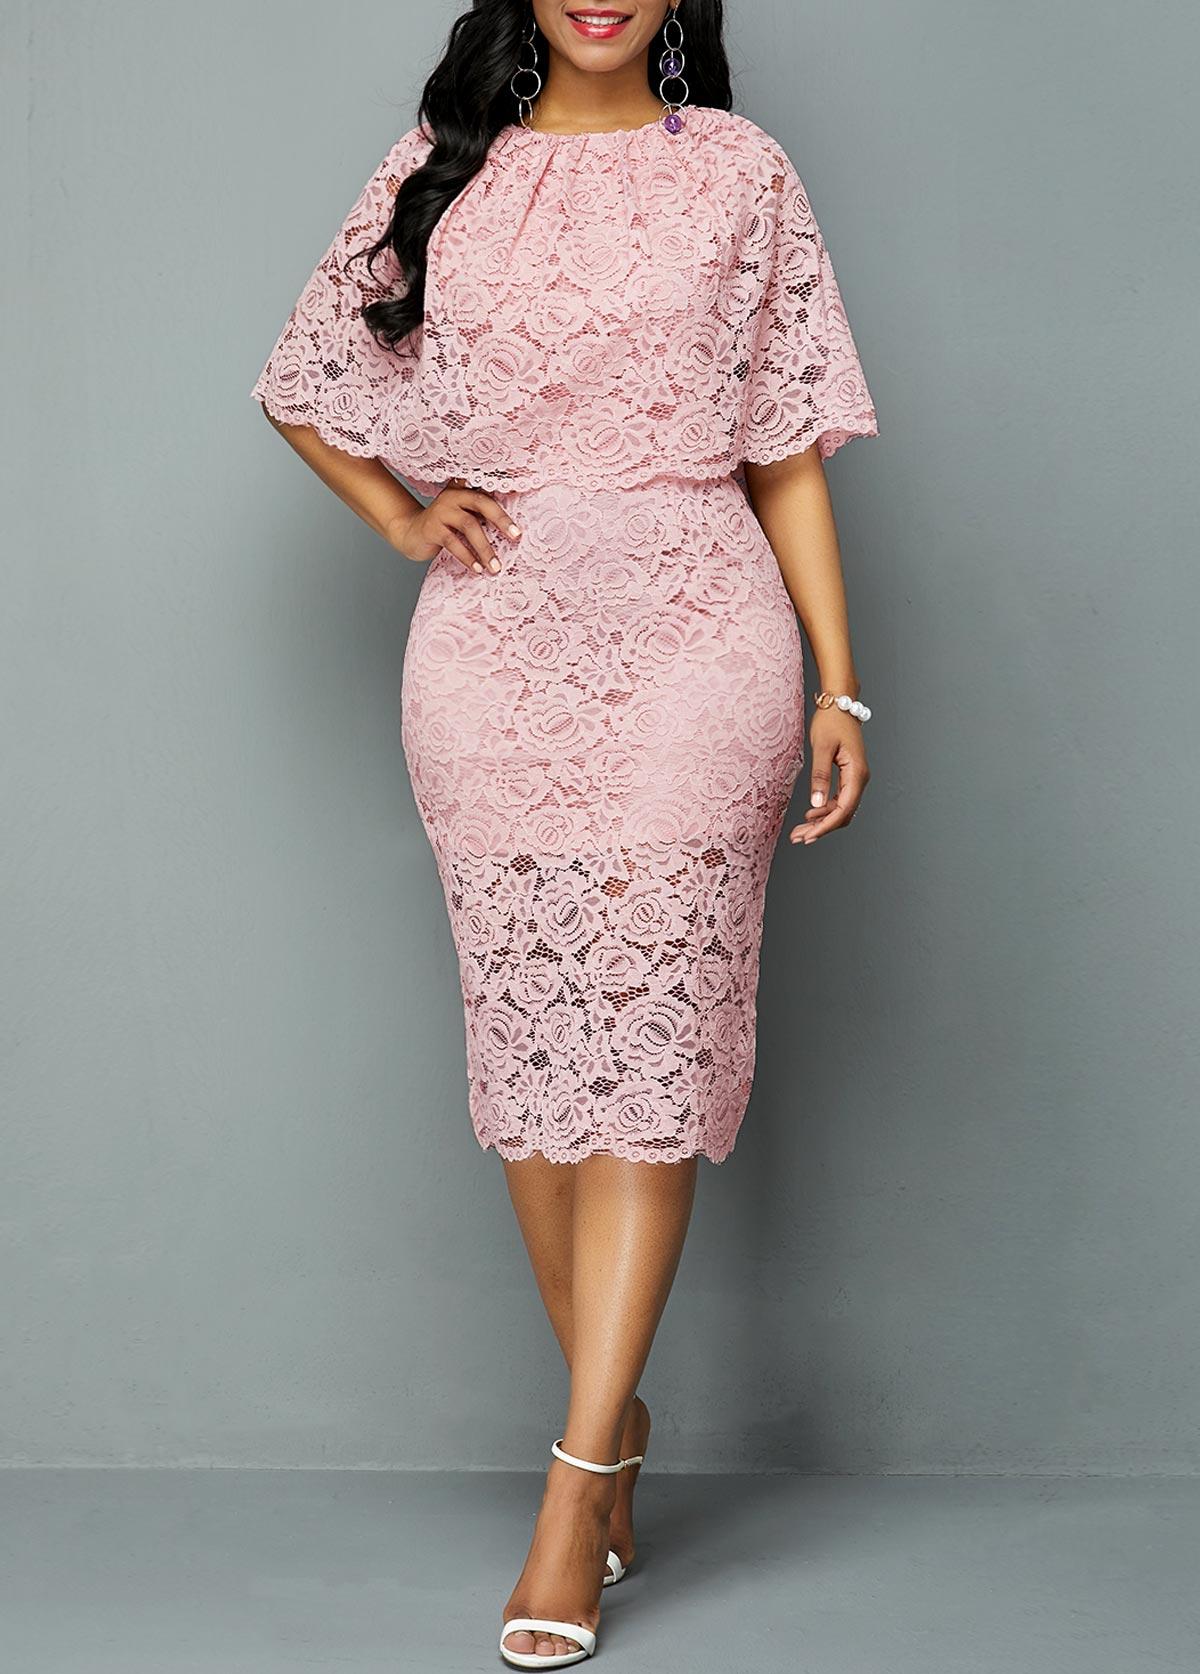 Light Pink Half Sleeve Overlay Embellished Lace Dress